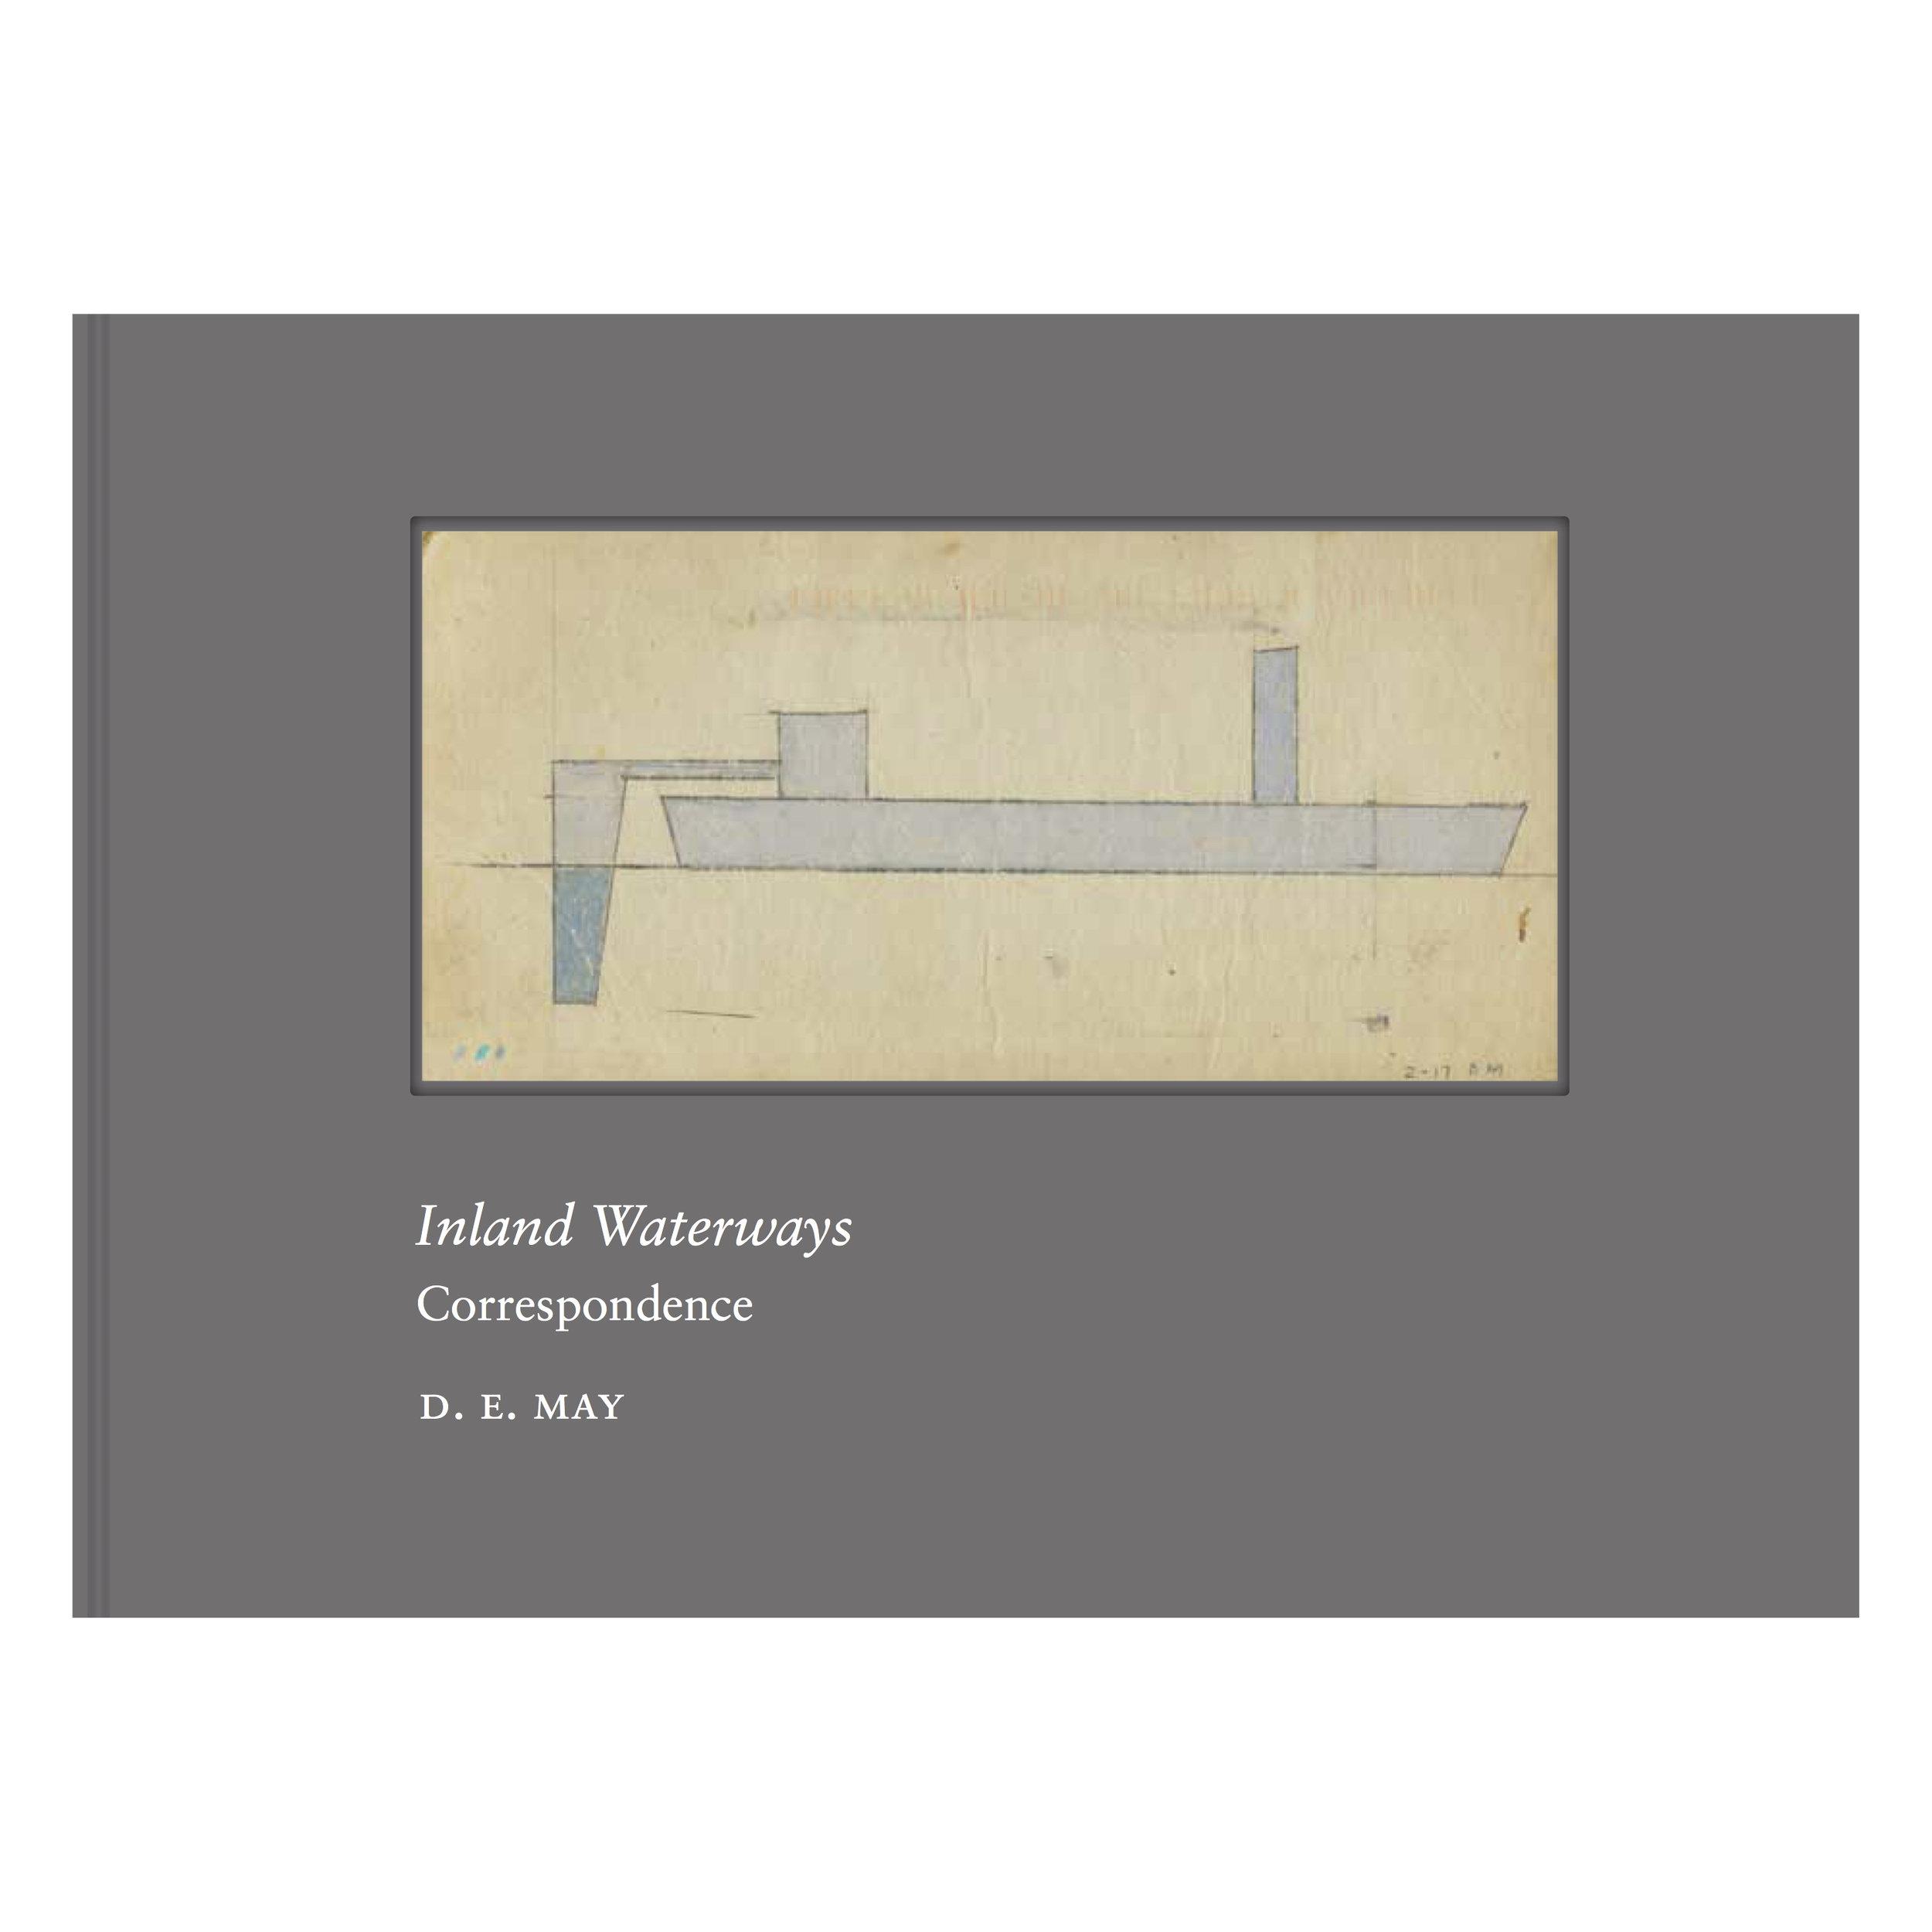 DM-Inland Waterways - Cover - sq.jpg